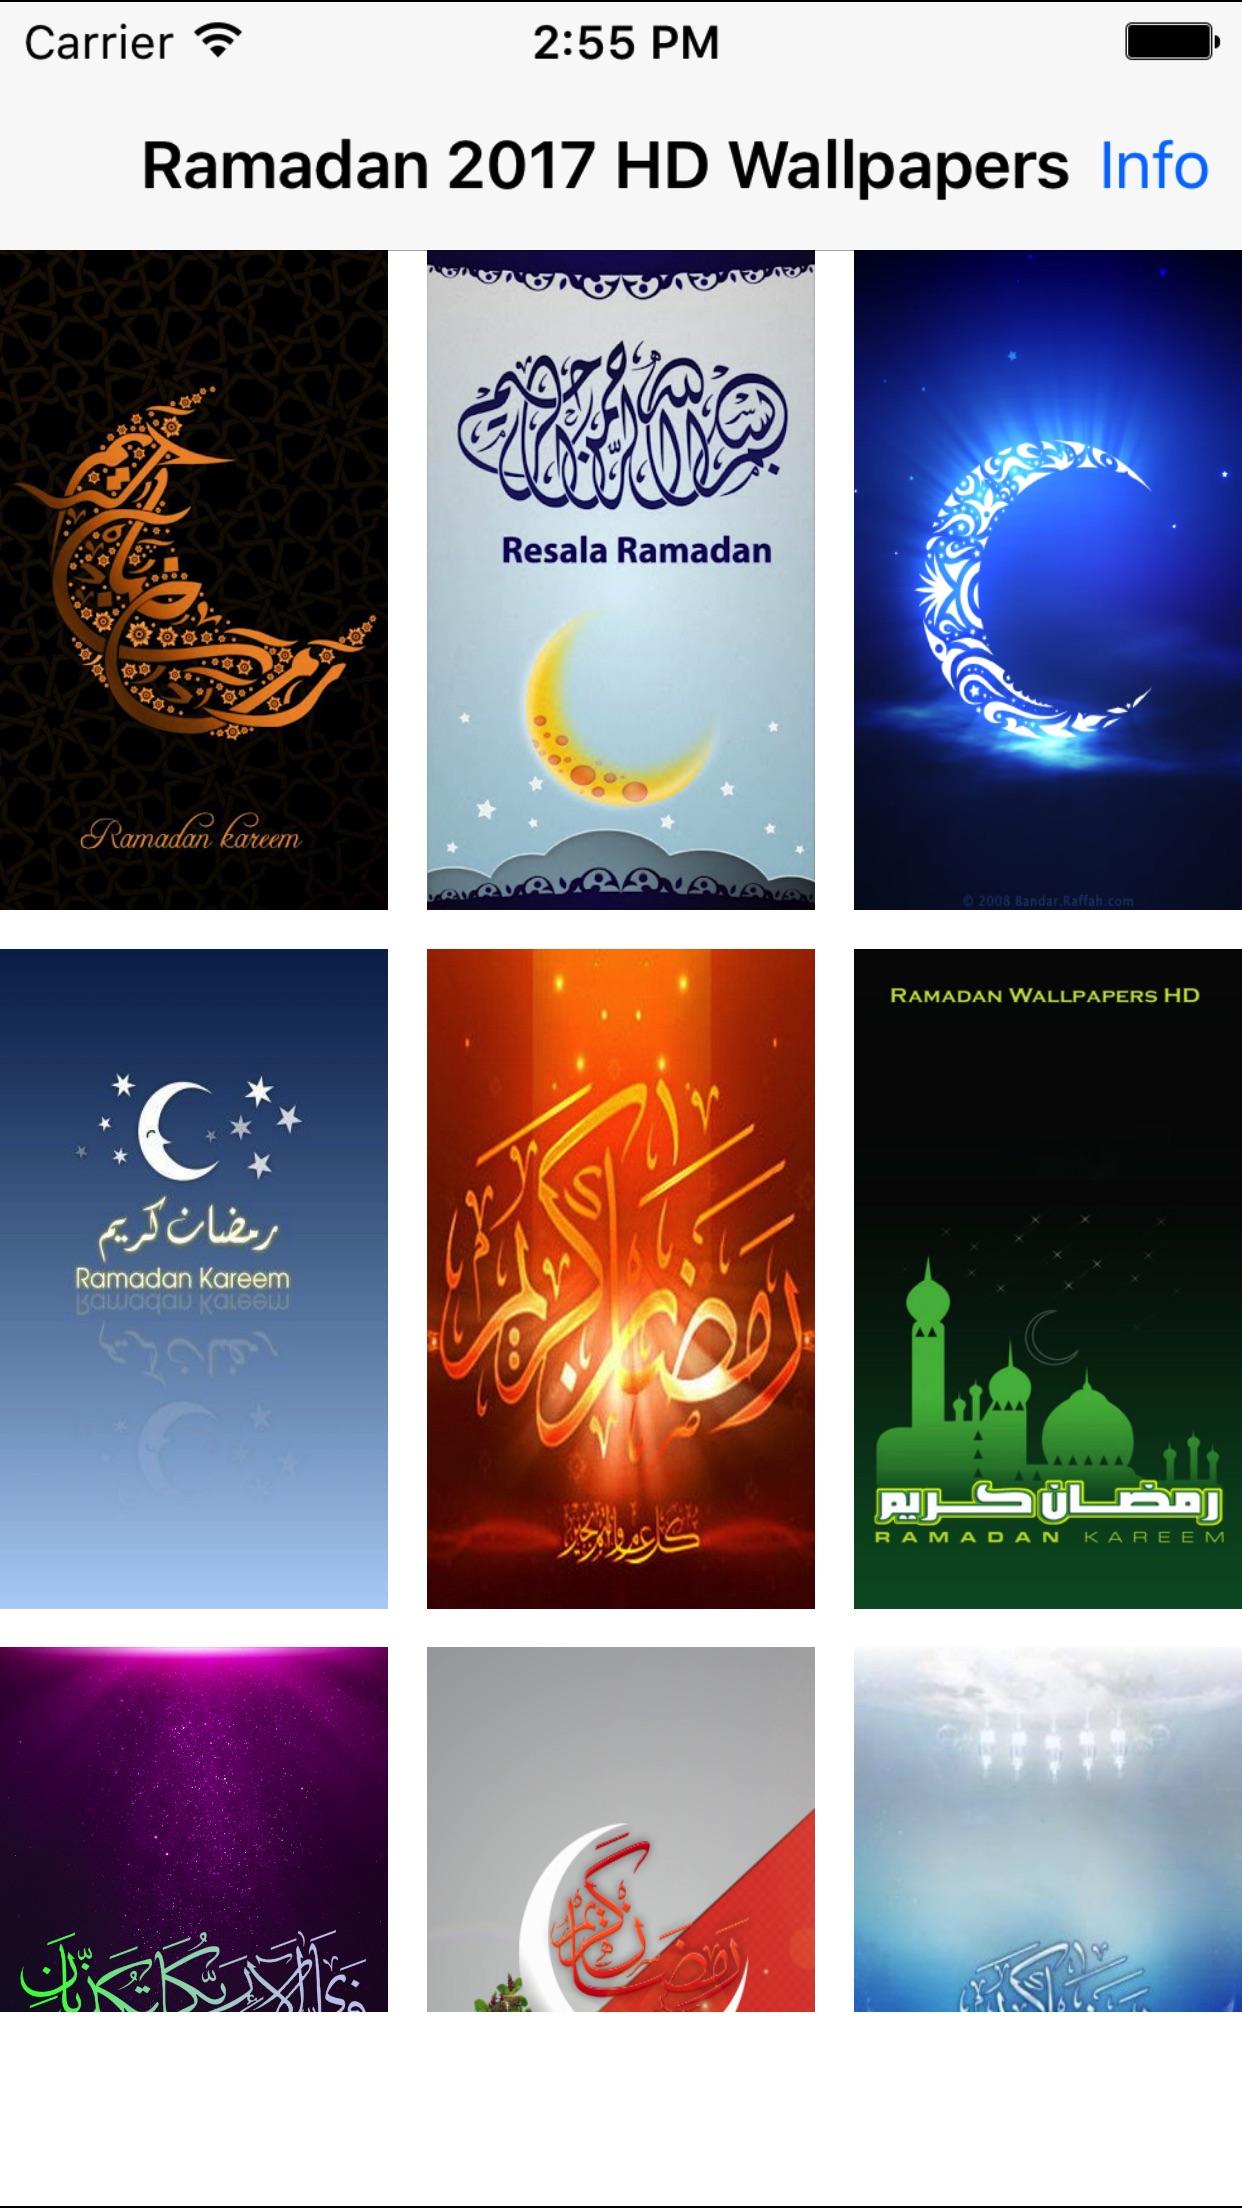 Ramadan 2017 (Eid Mubarak) - رمضان مبارك 2017 Screenshot